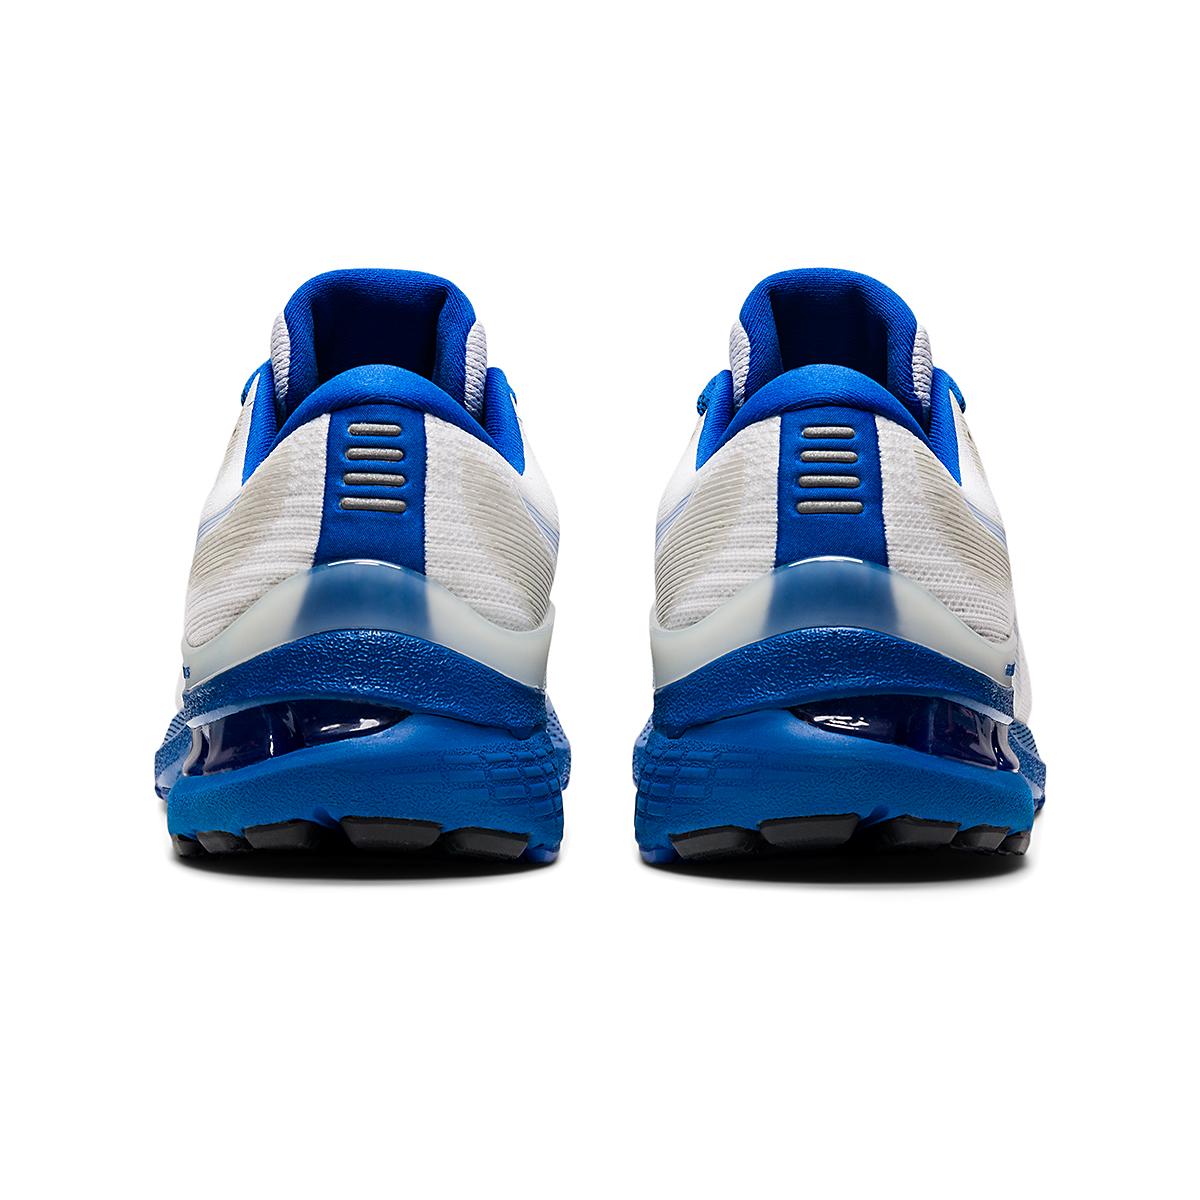 Men's Asics Gel-Kayano 28 Running Shoe - Color: White/Tuna Blue - JackRabbit Exclusive - Size: 6.5 - Width: Regular, White/Tuna Blue - JackRabbit Exclusive, large, image 5